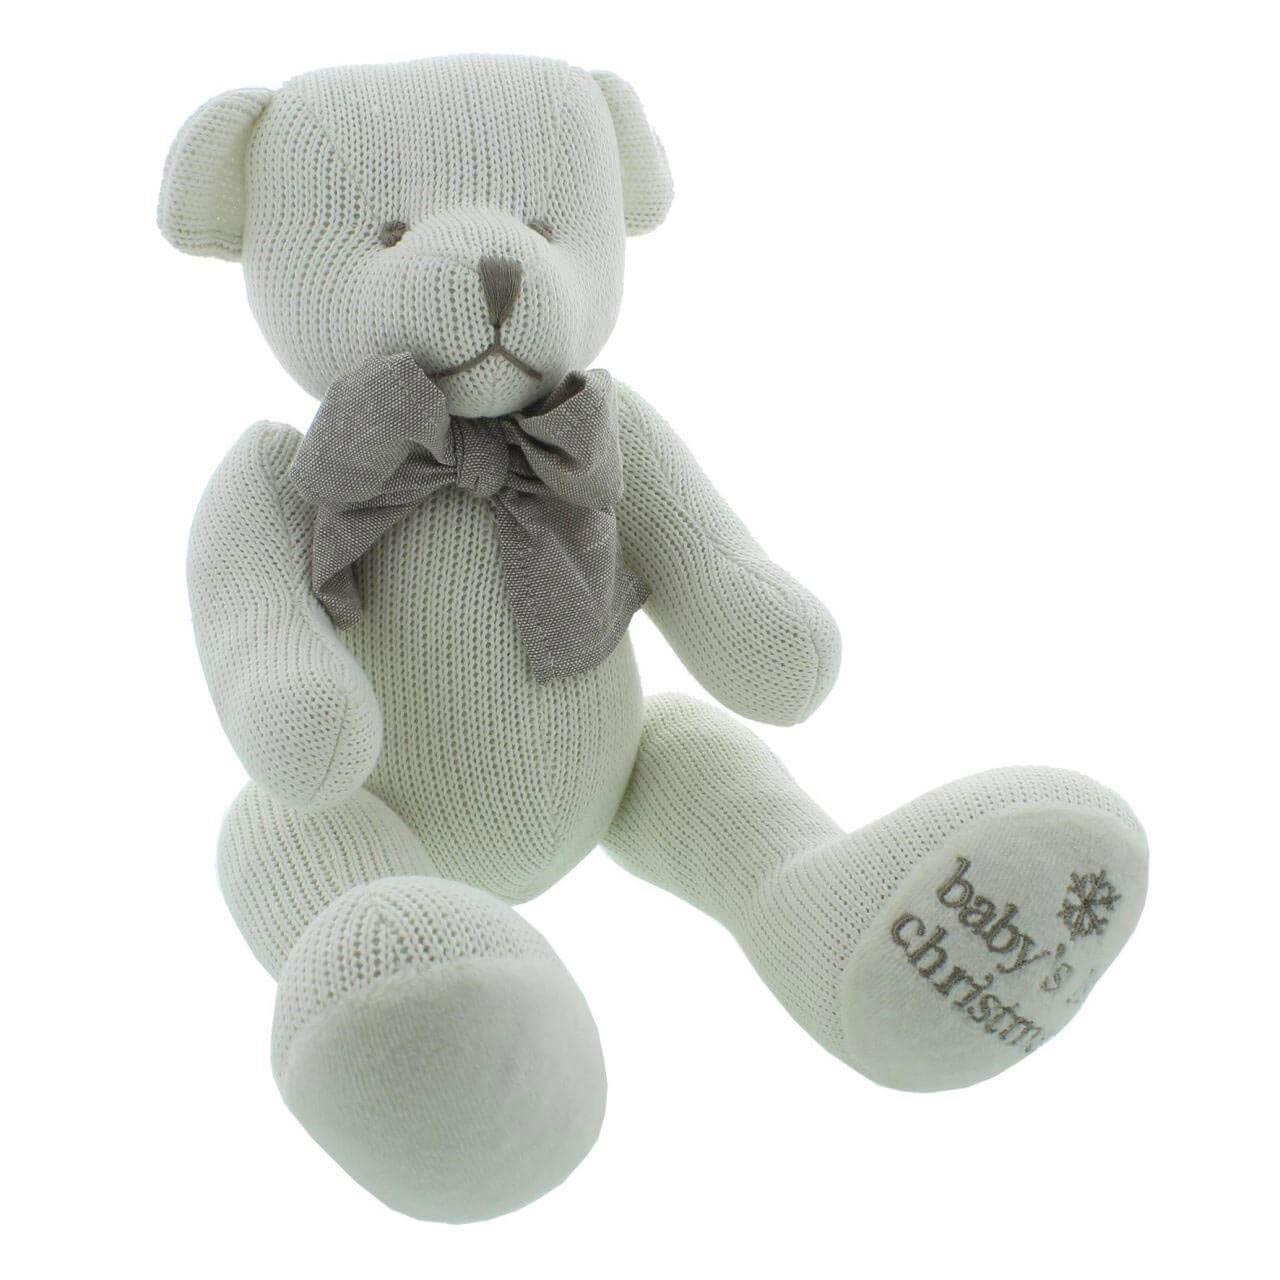 Bambino by Juliana - Ursulet tricotat Baby's 1st Christmas